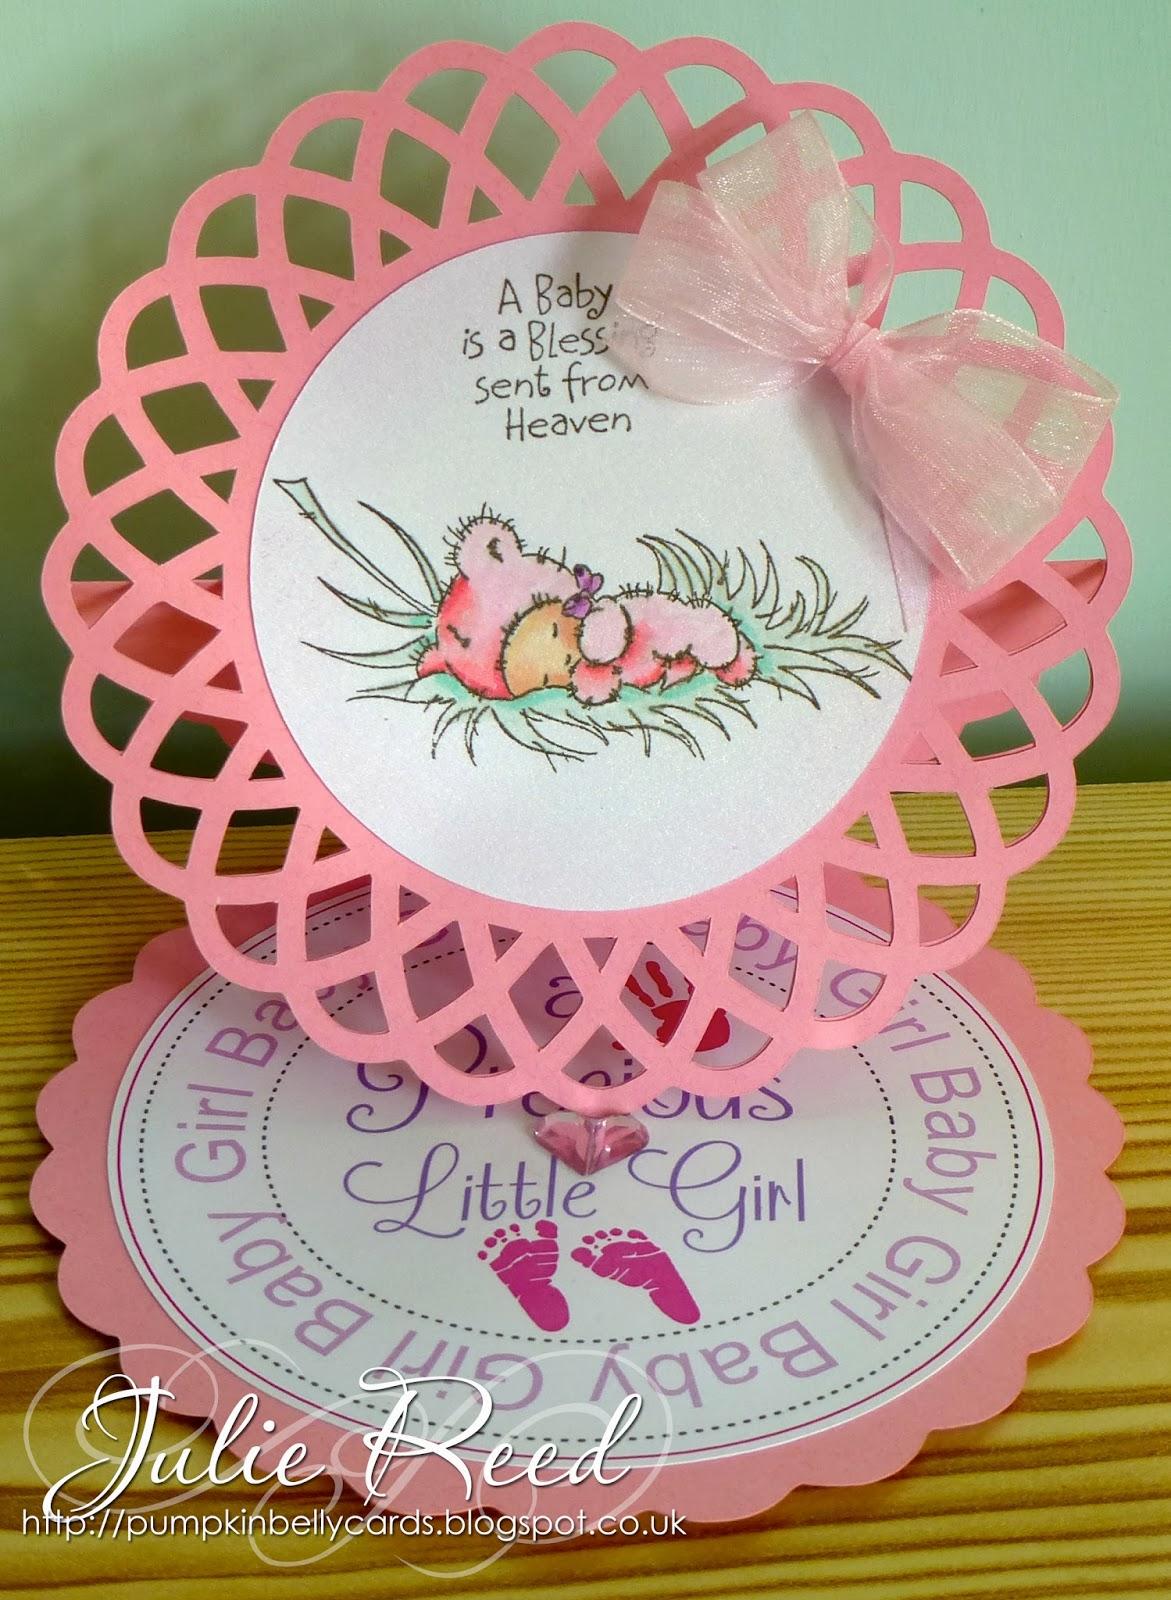 Pumpkin Belly Cards: Sweet Baby Girl